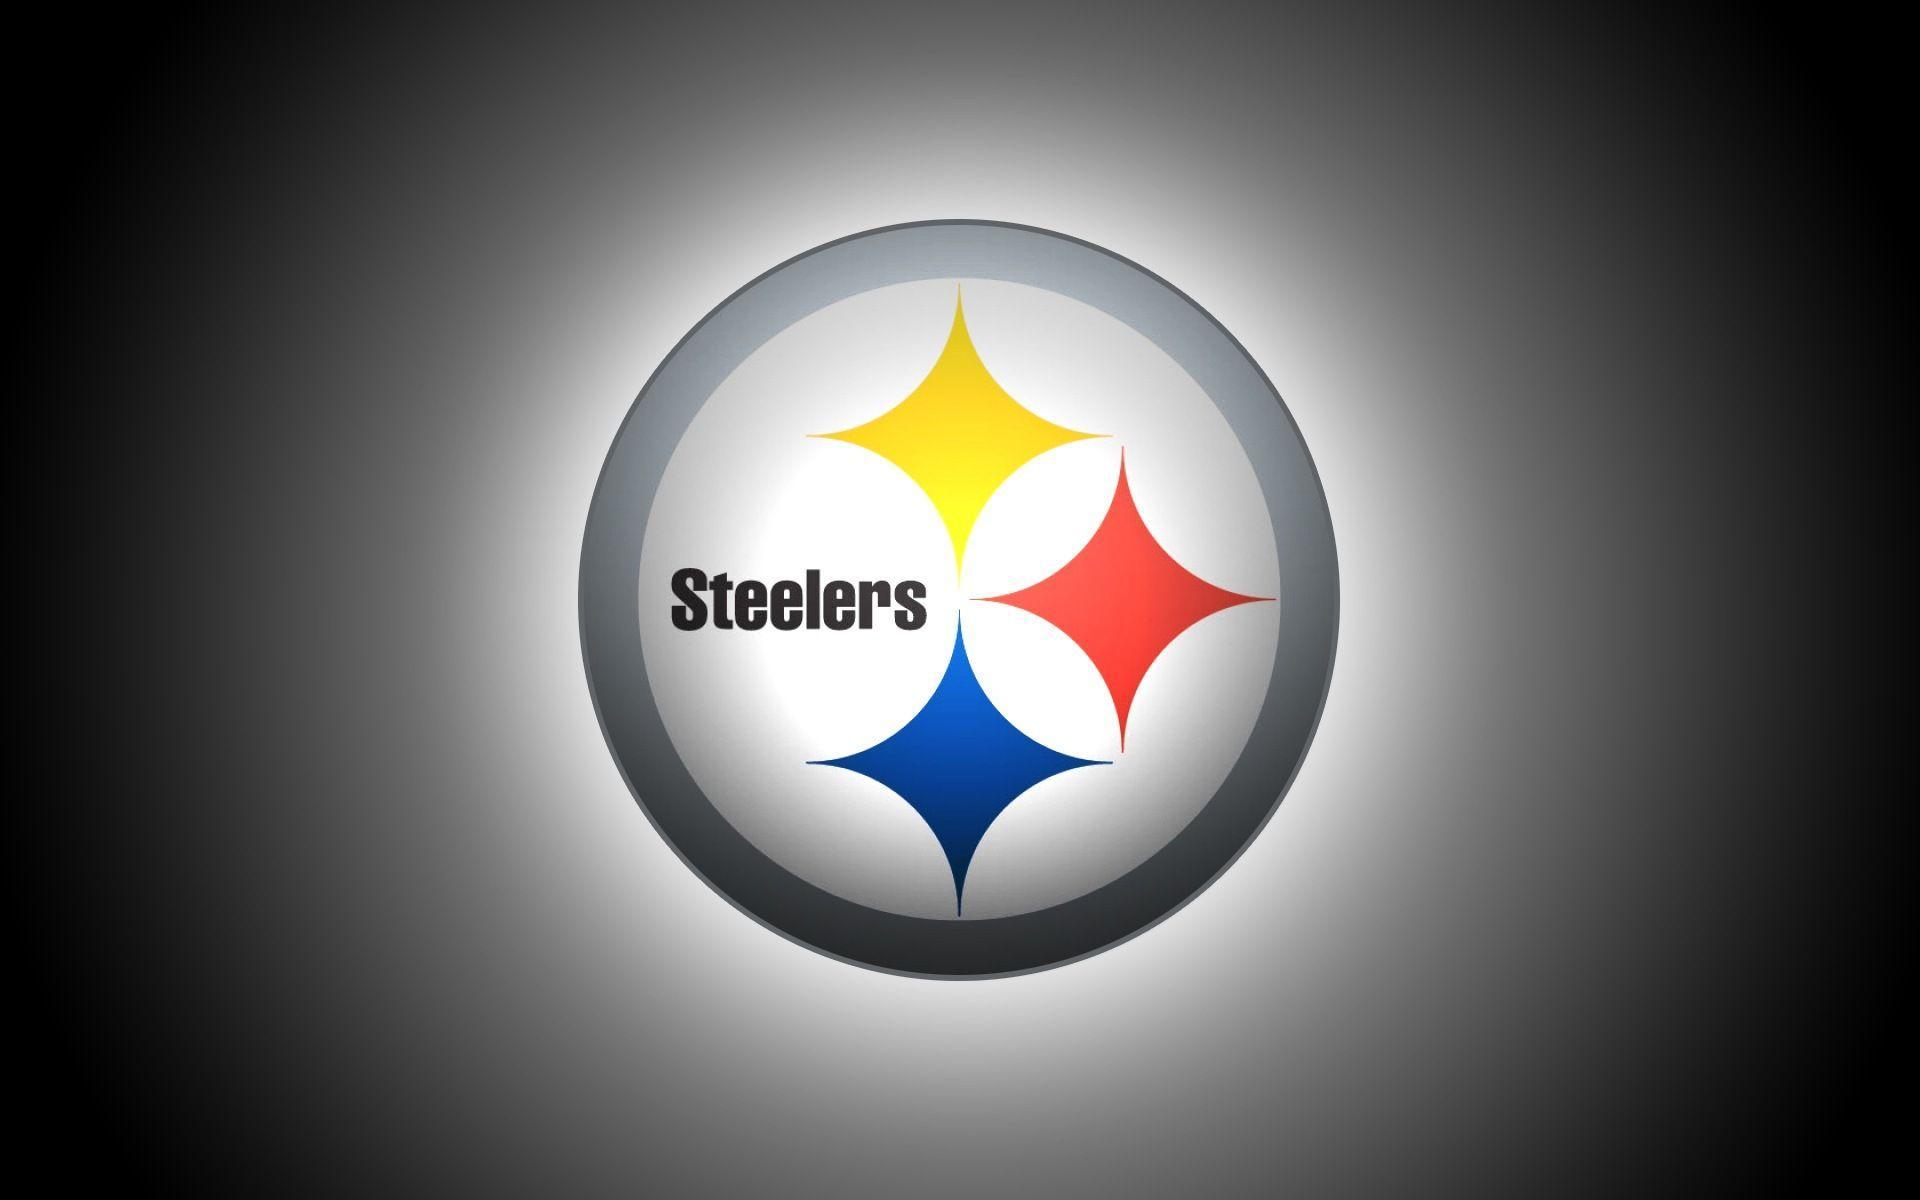 Pittsburgh Steelers Desktop Wallpapers 1920x1200